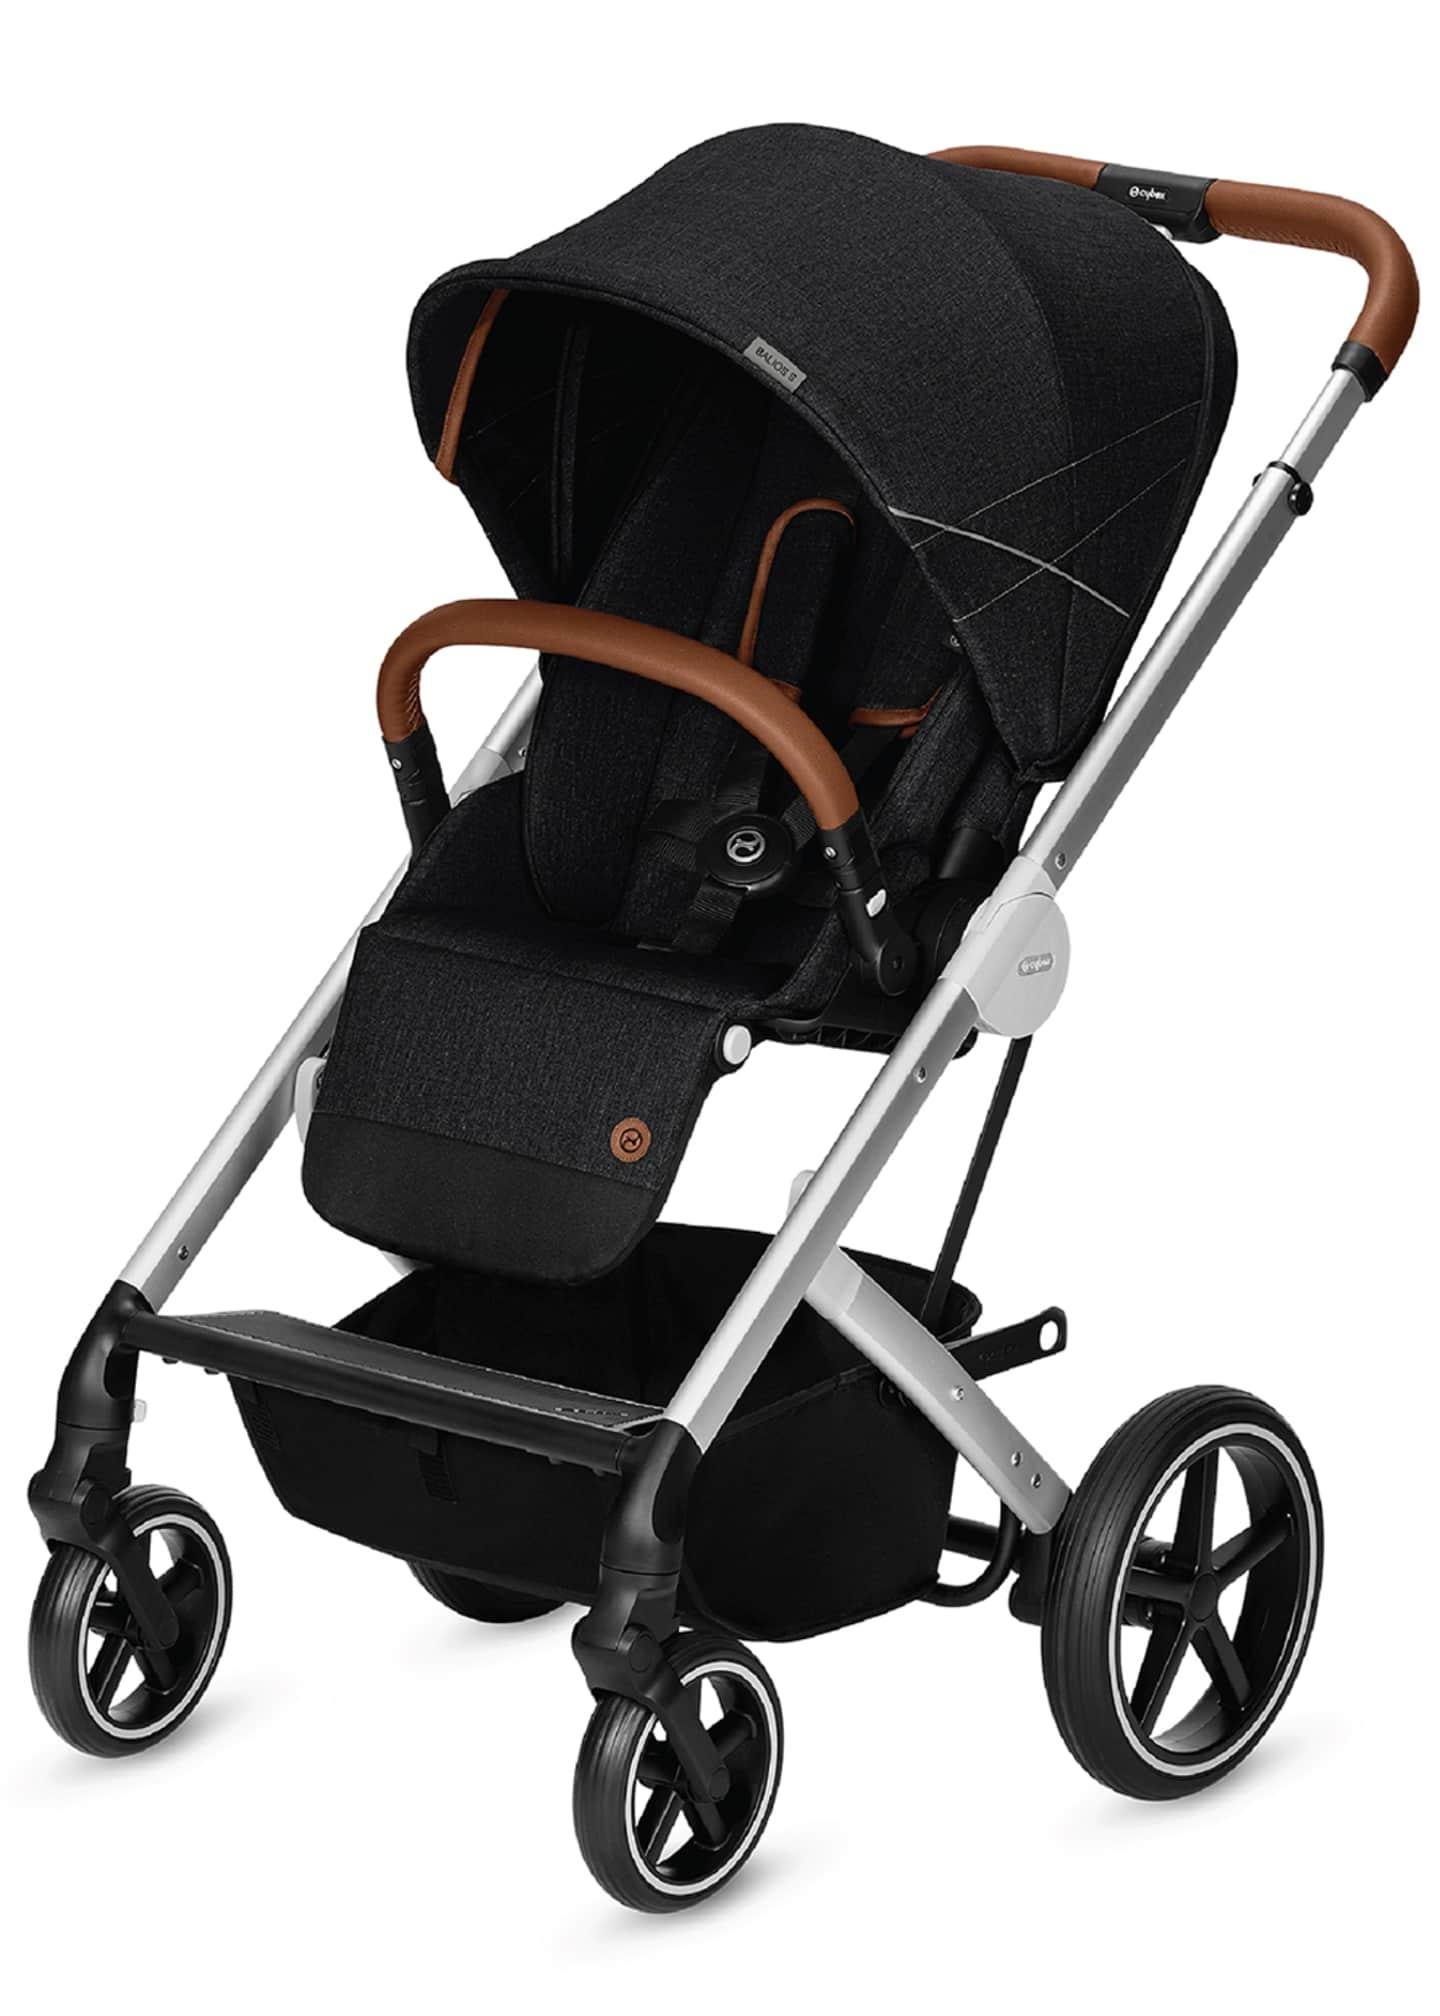 Cybex Balios S Stroller, Lavastone Black